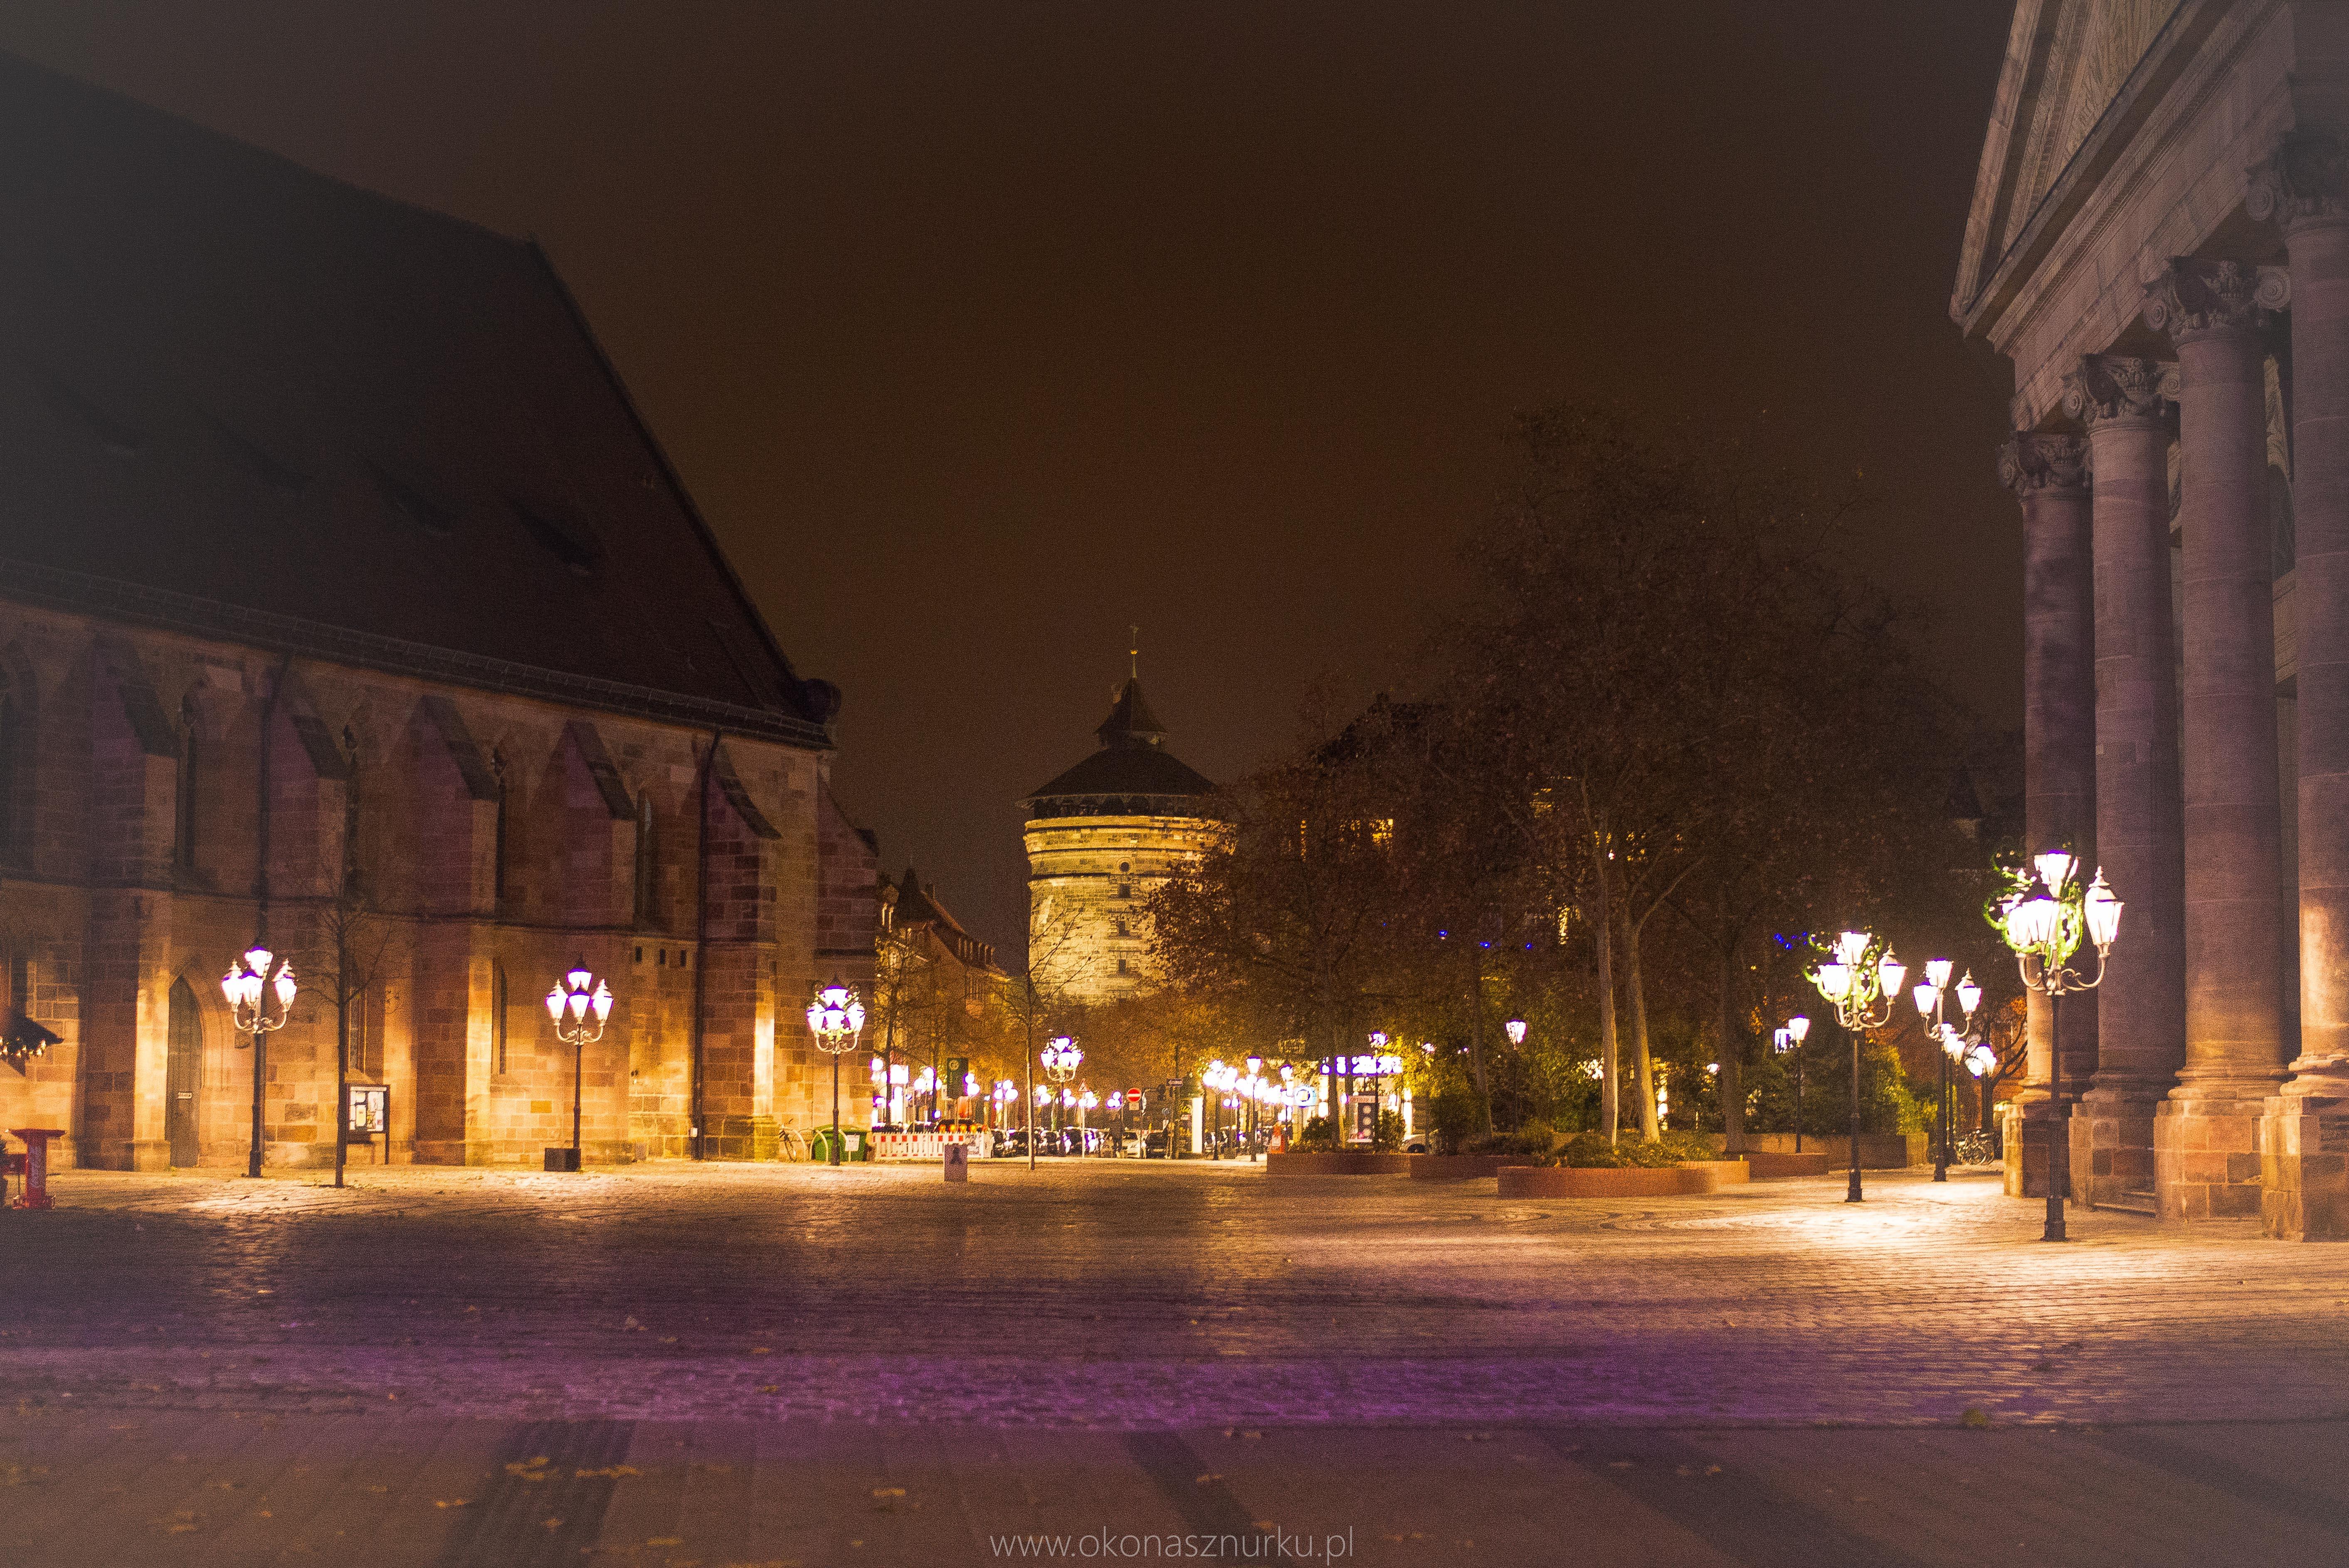 Nürnberg-stadt-norymberga-bayern-city-frankonia (10)